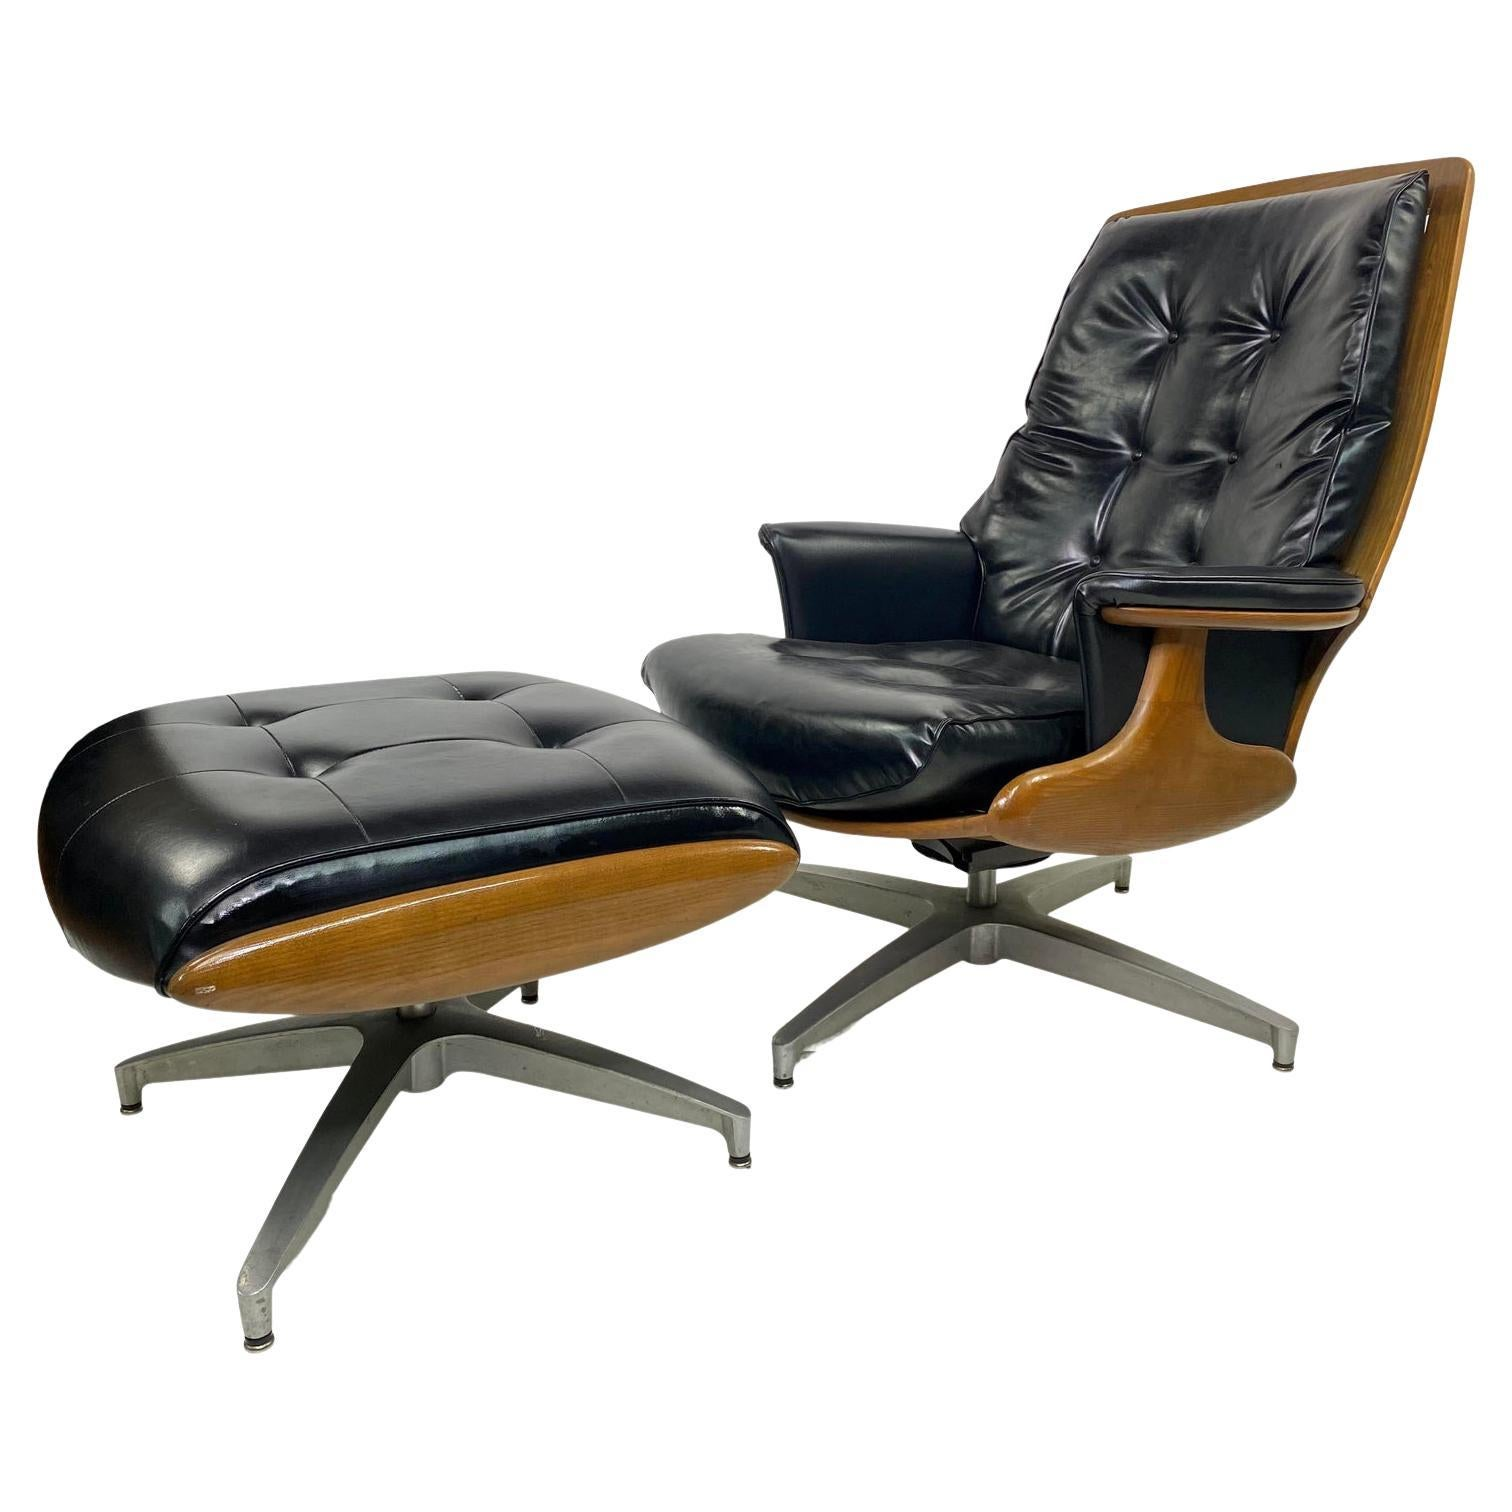 Heywood-Wakefield Lounge Chair and Ottoman